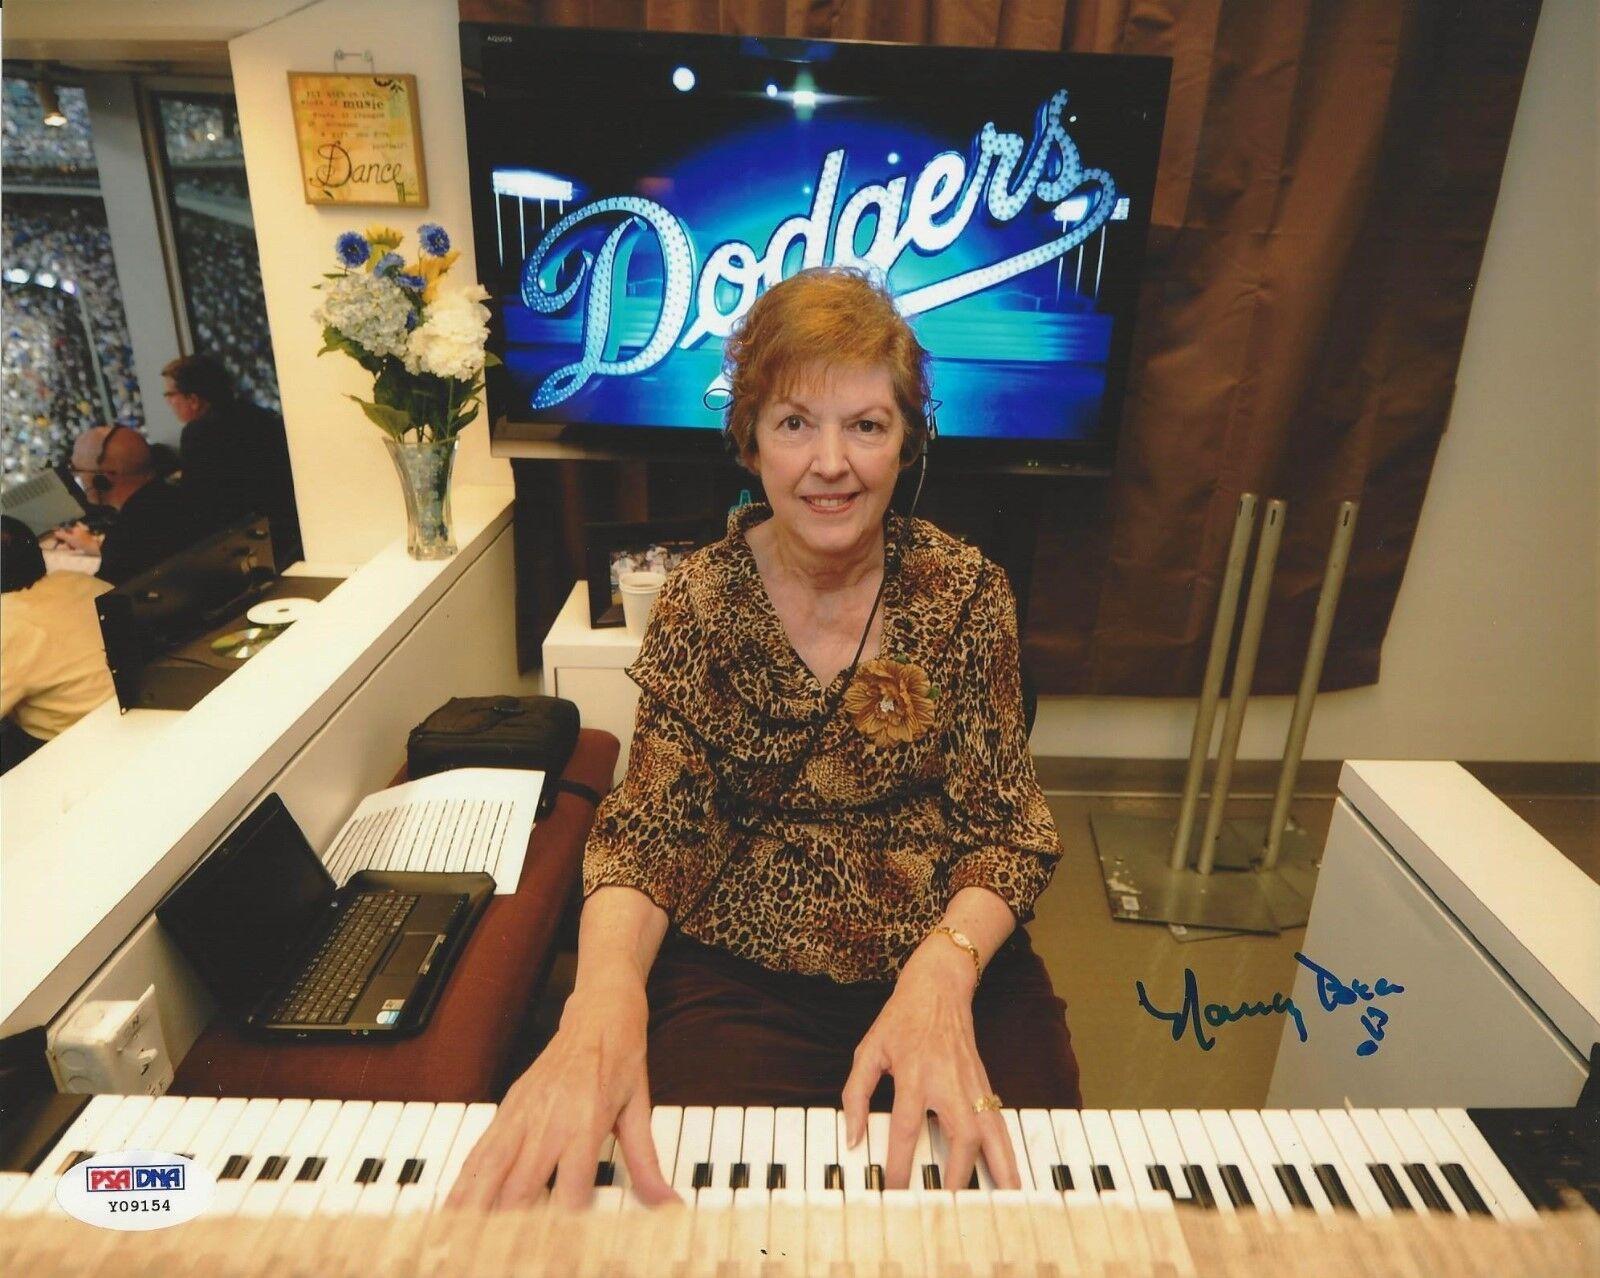 Nancy Bea Hefley Dodgers Organist Signed 8x10 - PSA/DNA # Y09154